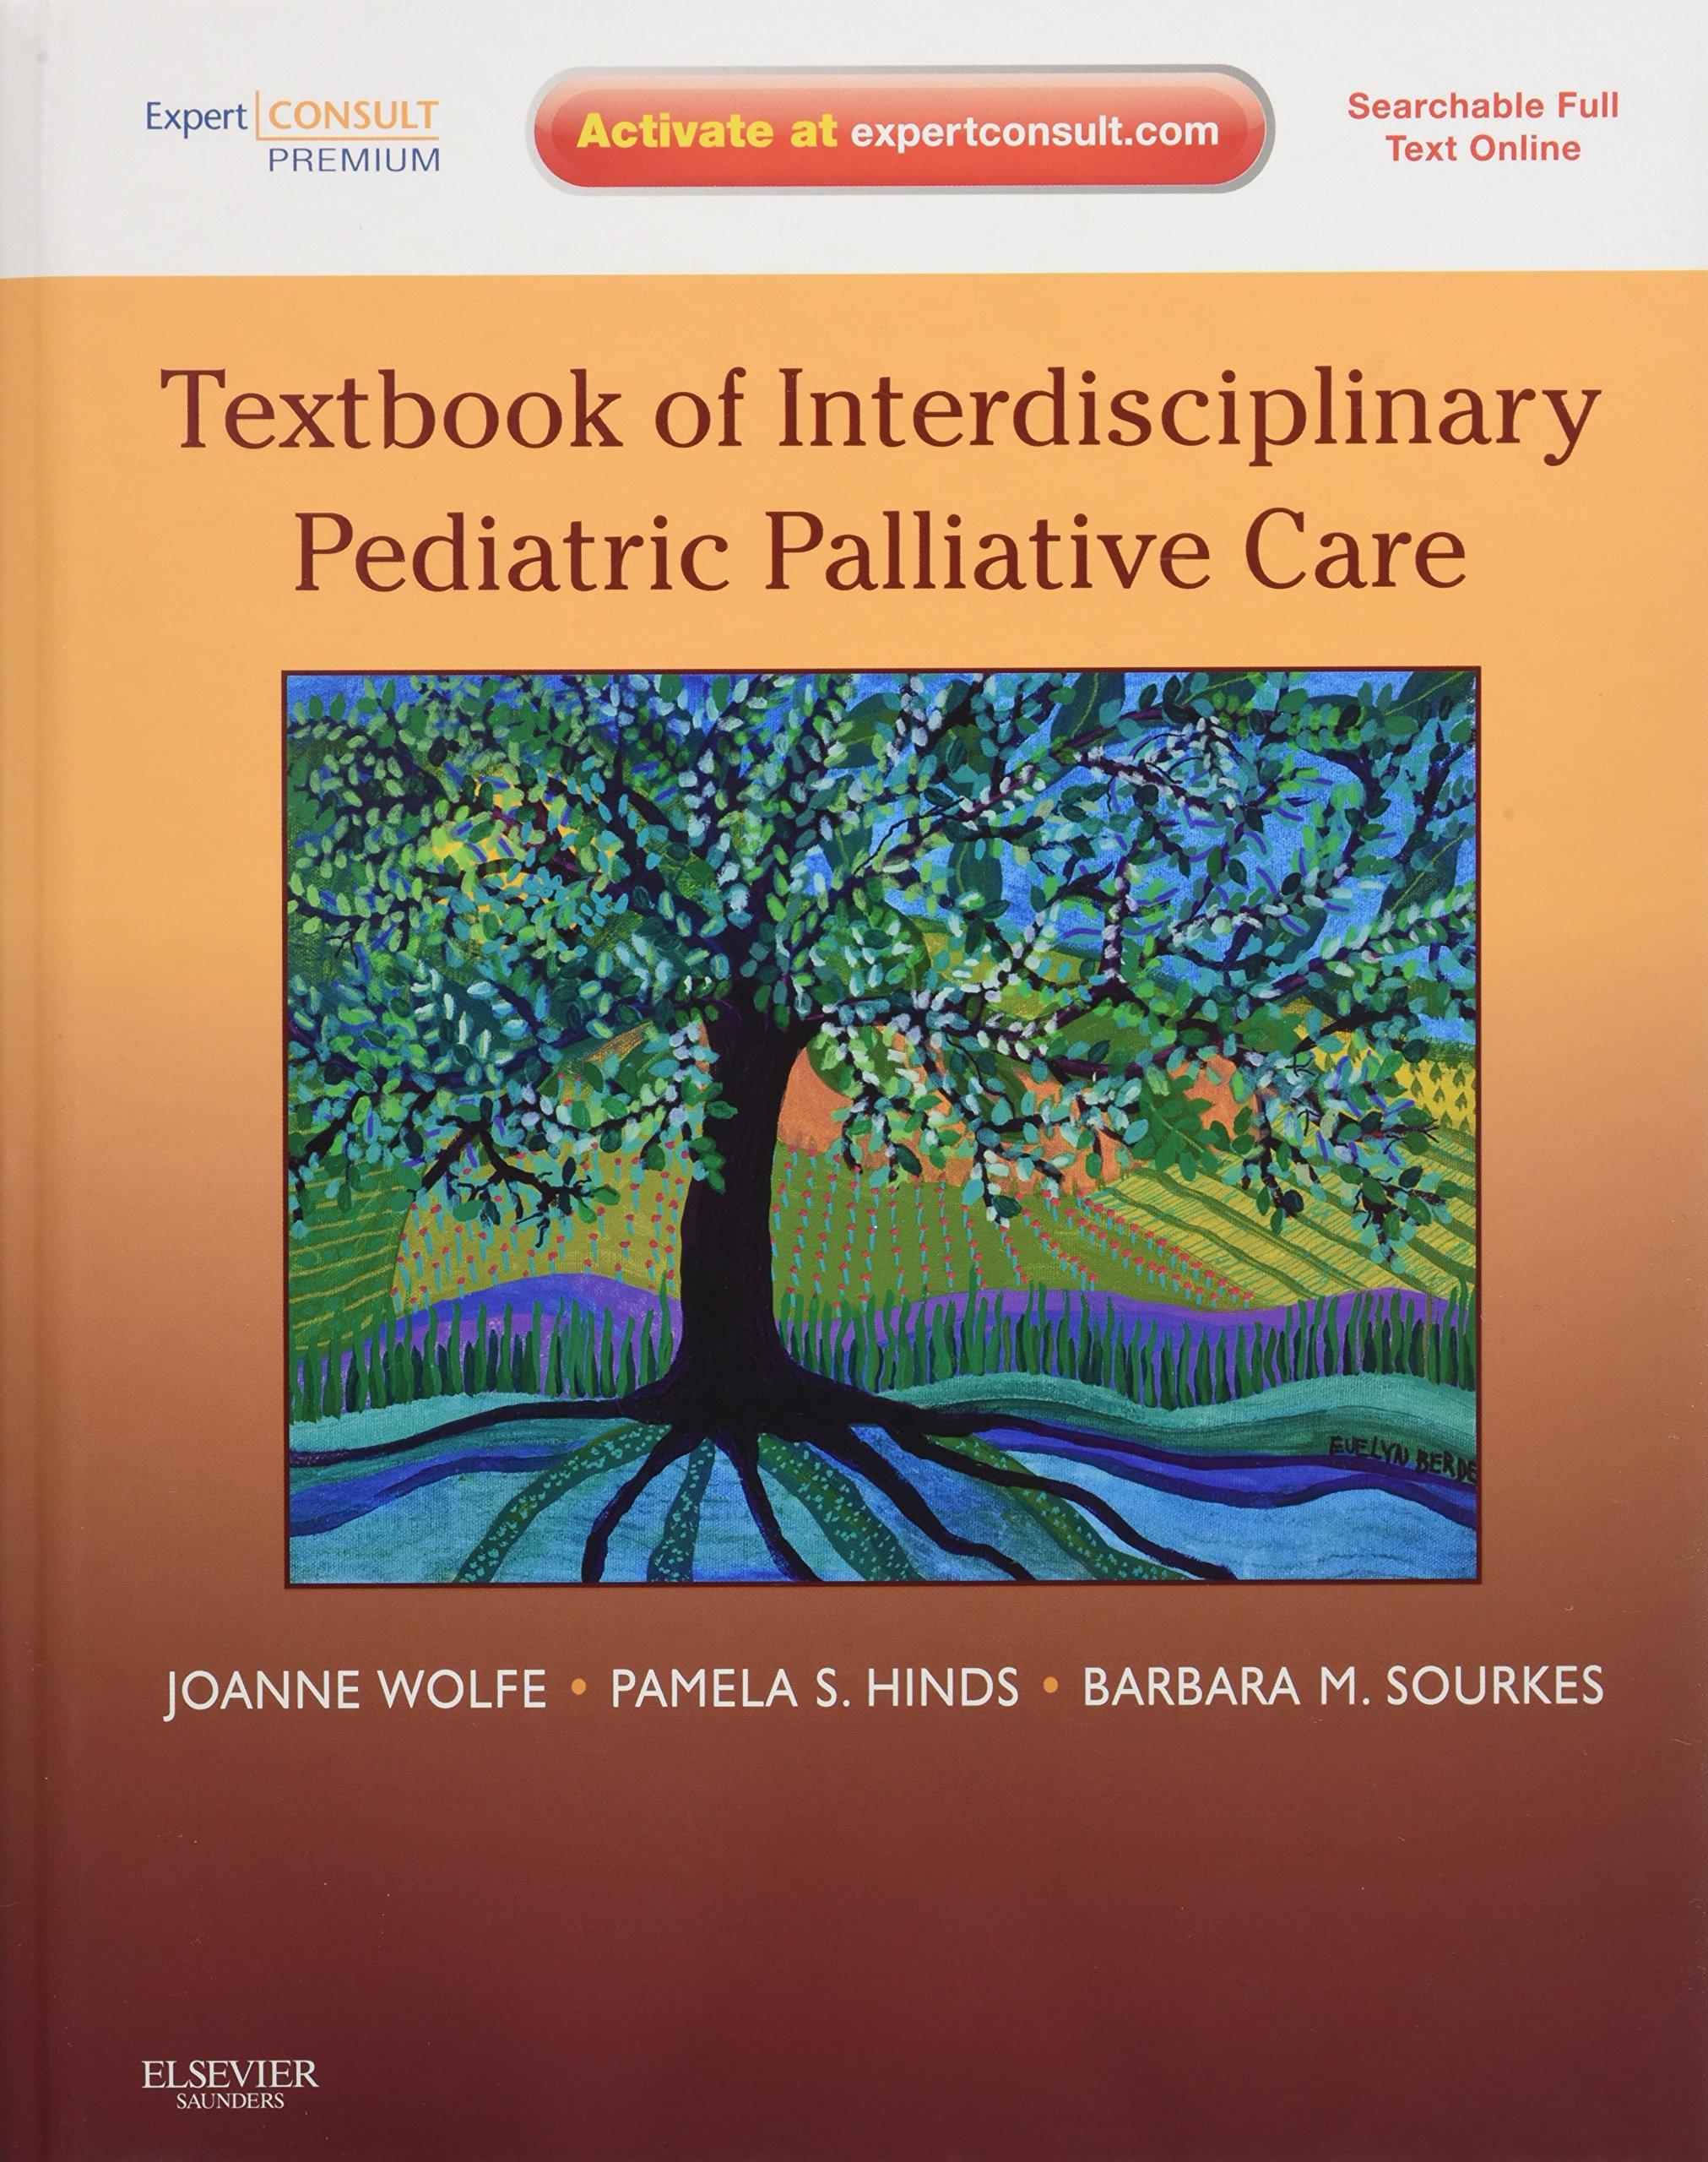 Nursing: The Ultimate Nursing Guide Book for Nursing School with all the Nursing Essentials and Fundamentals (Nursing Medical School Doctor) (English Edition)